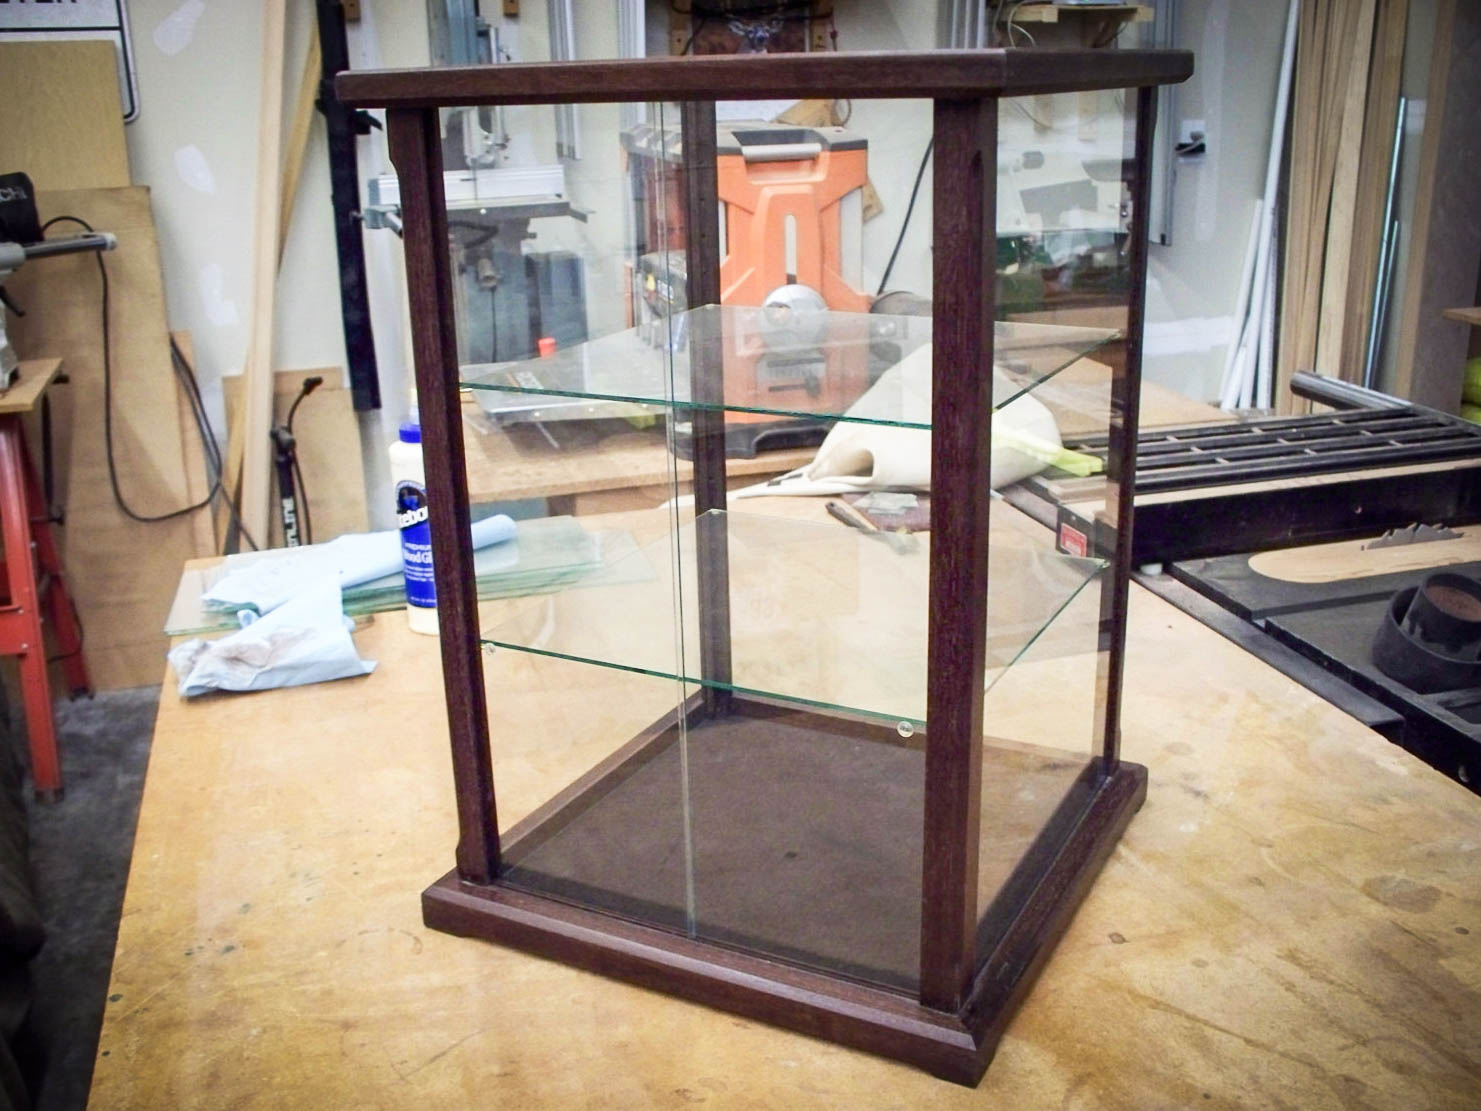 Handmade Peruvian Walnut Display Case With Adjustable Shelves And Glass Sliding Door